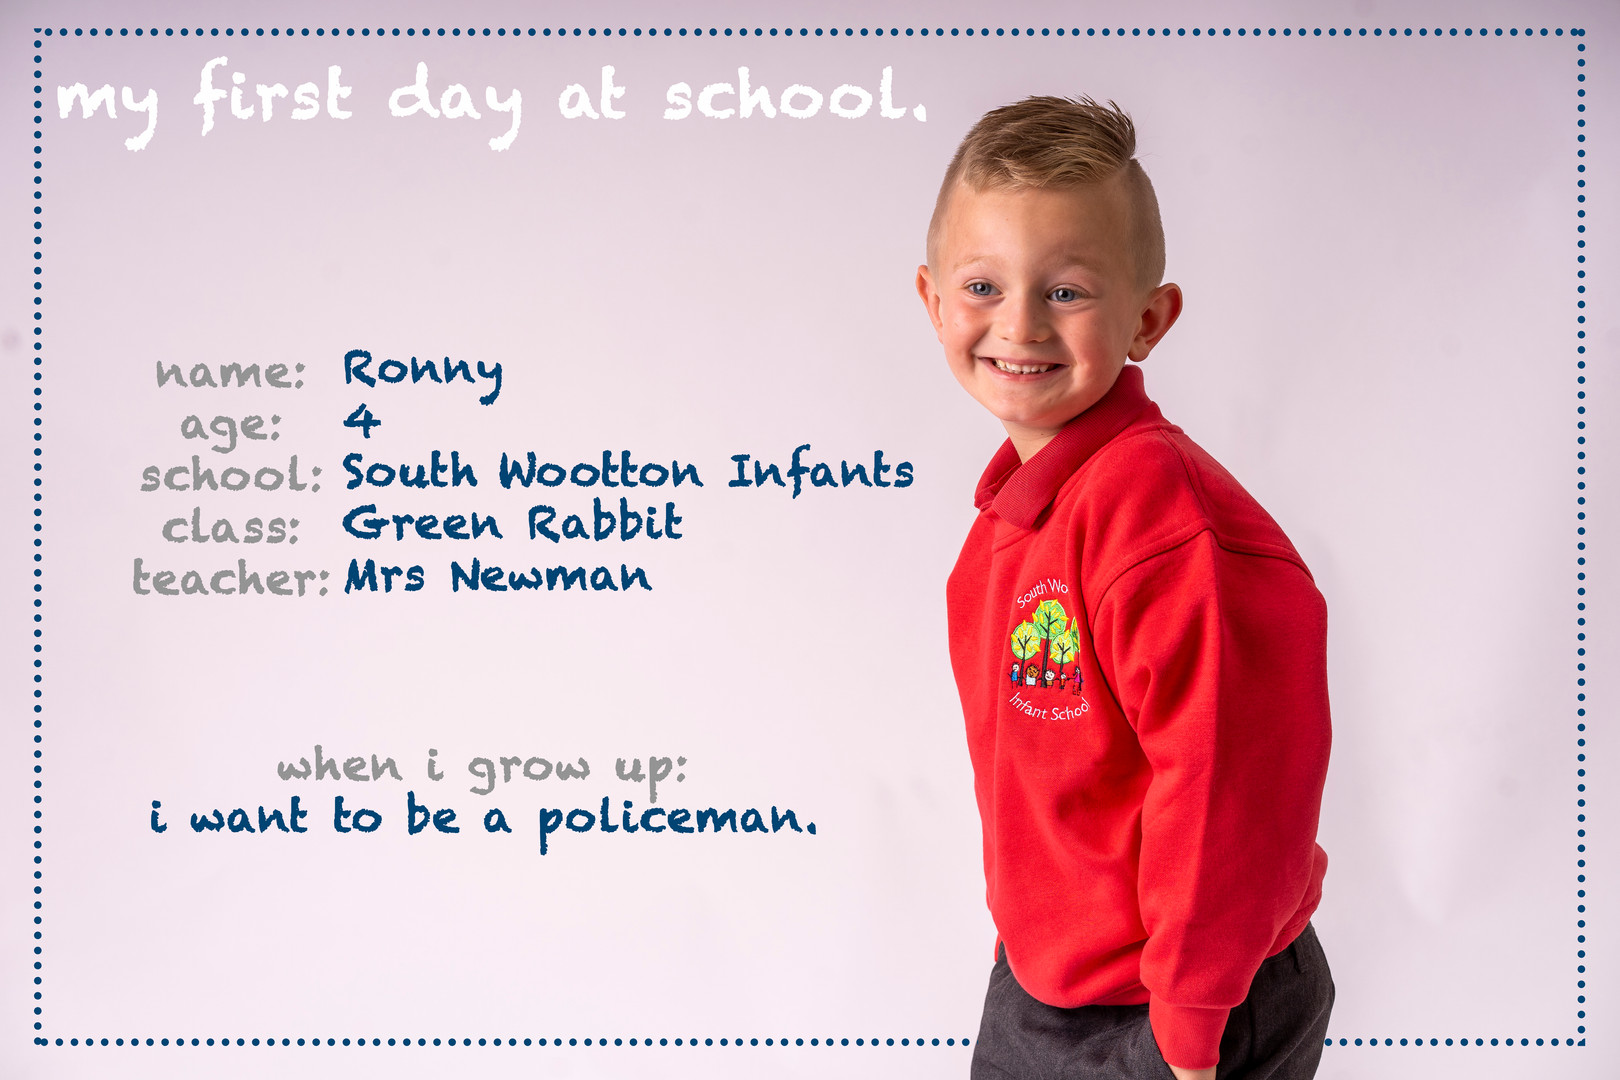 Ronny Advert.jpg